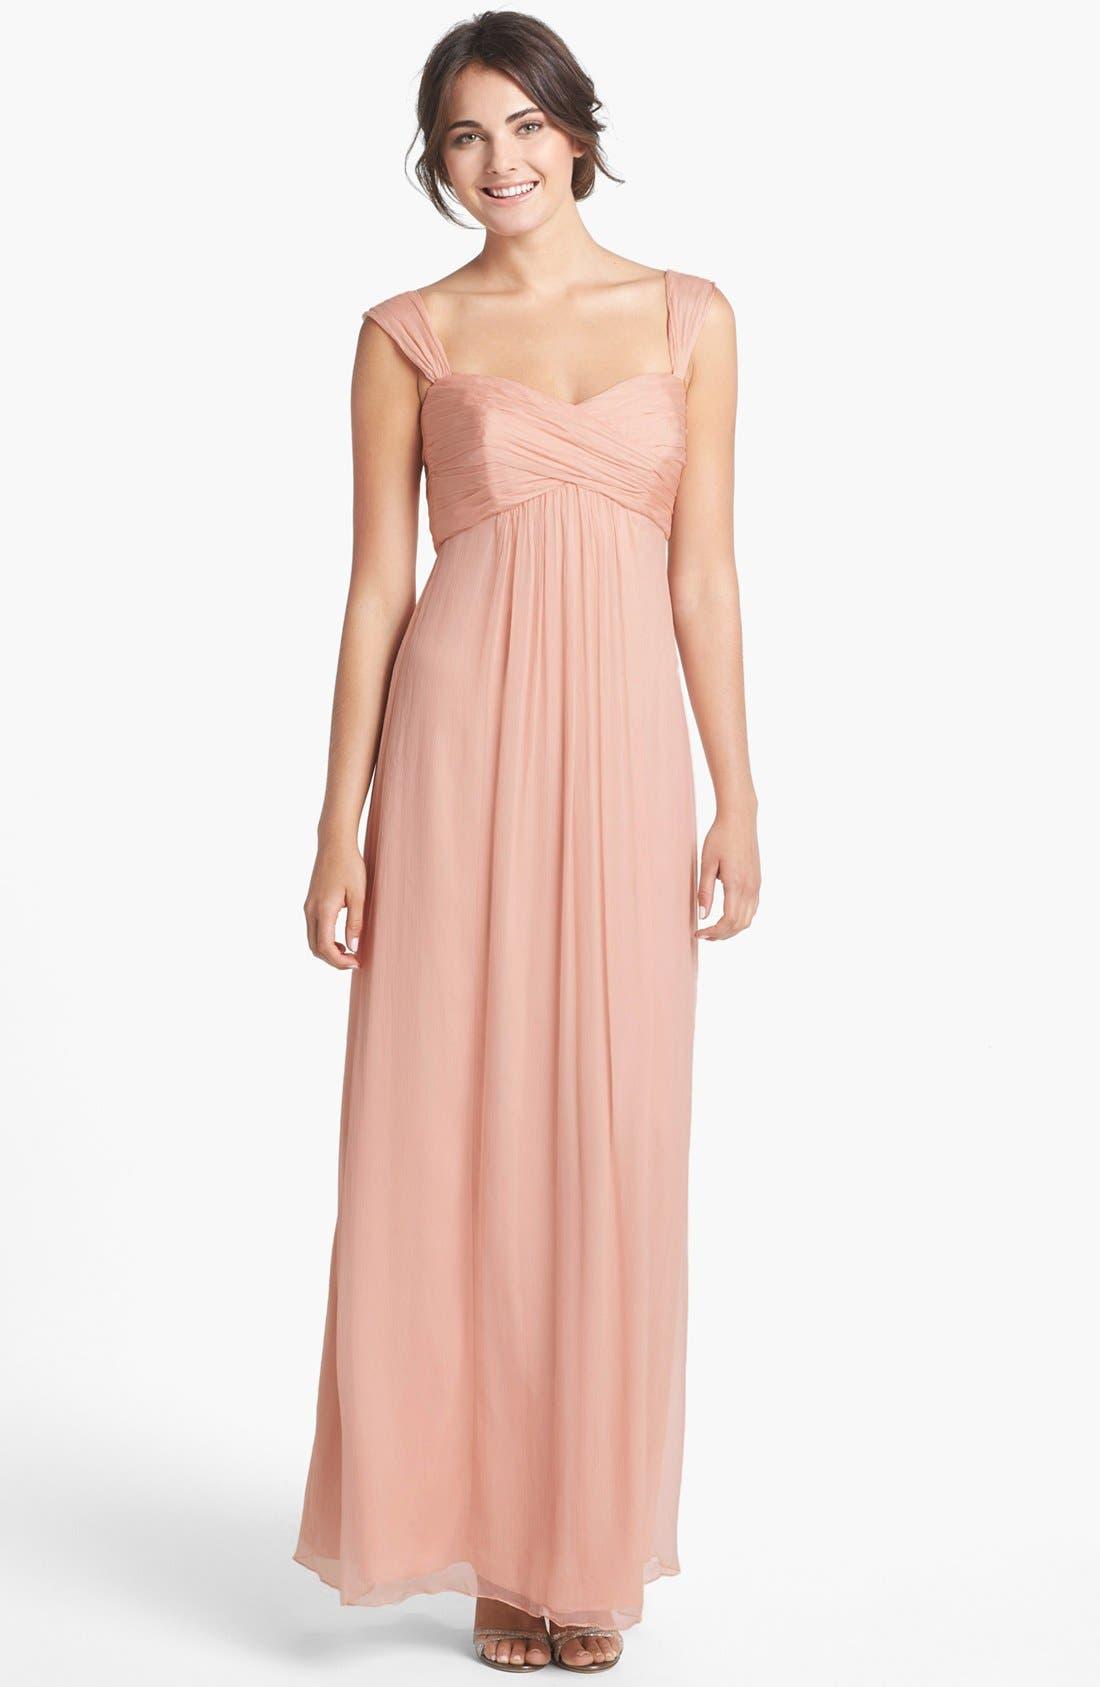 Main Image - Amsale Cap Sleeve Chiffon Gown